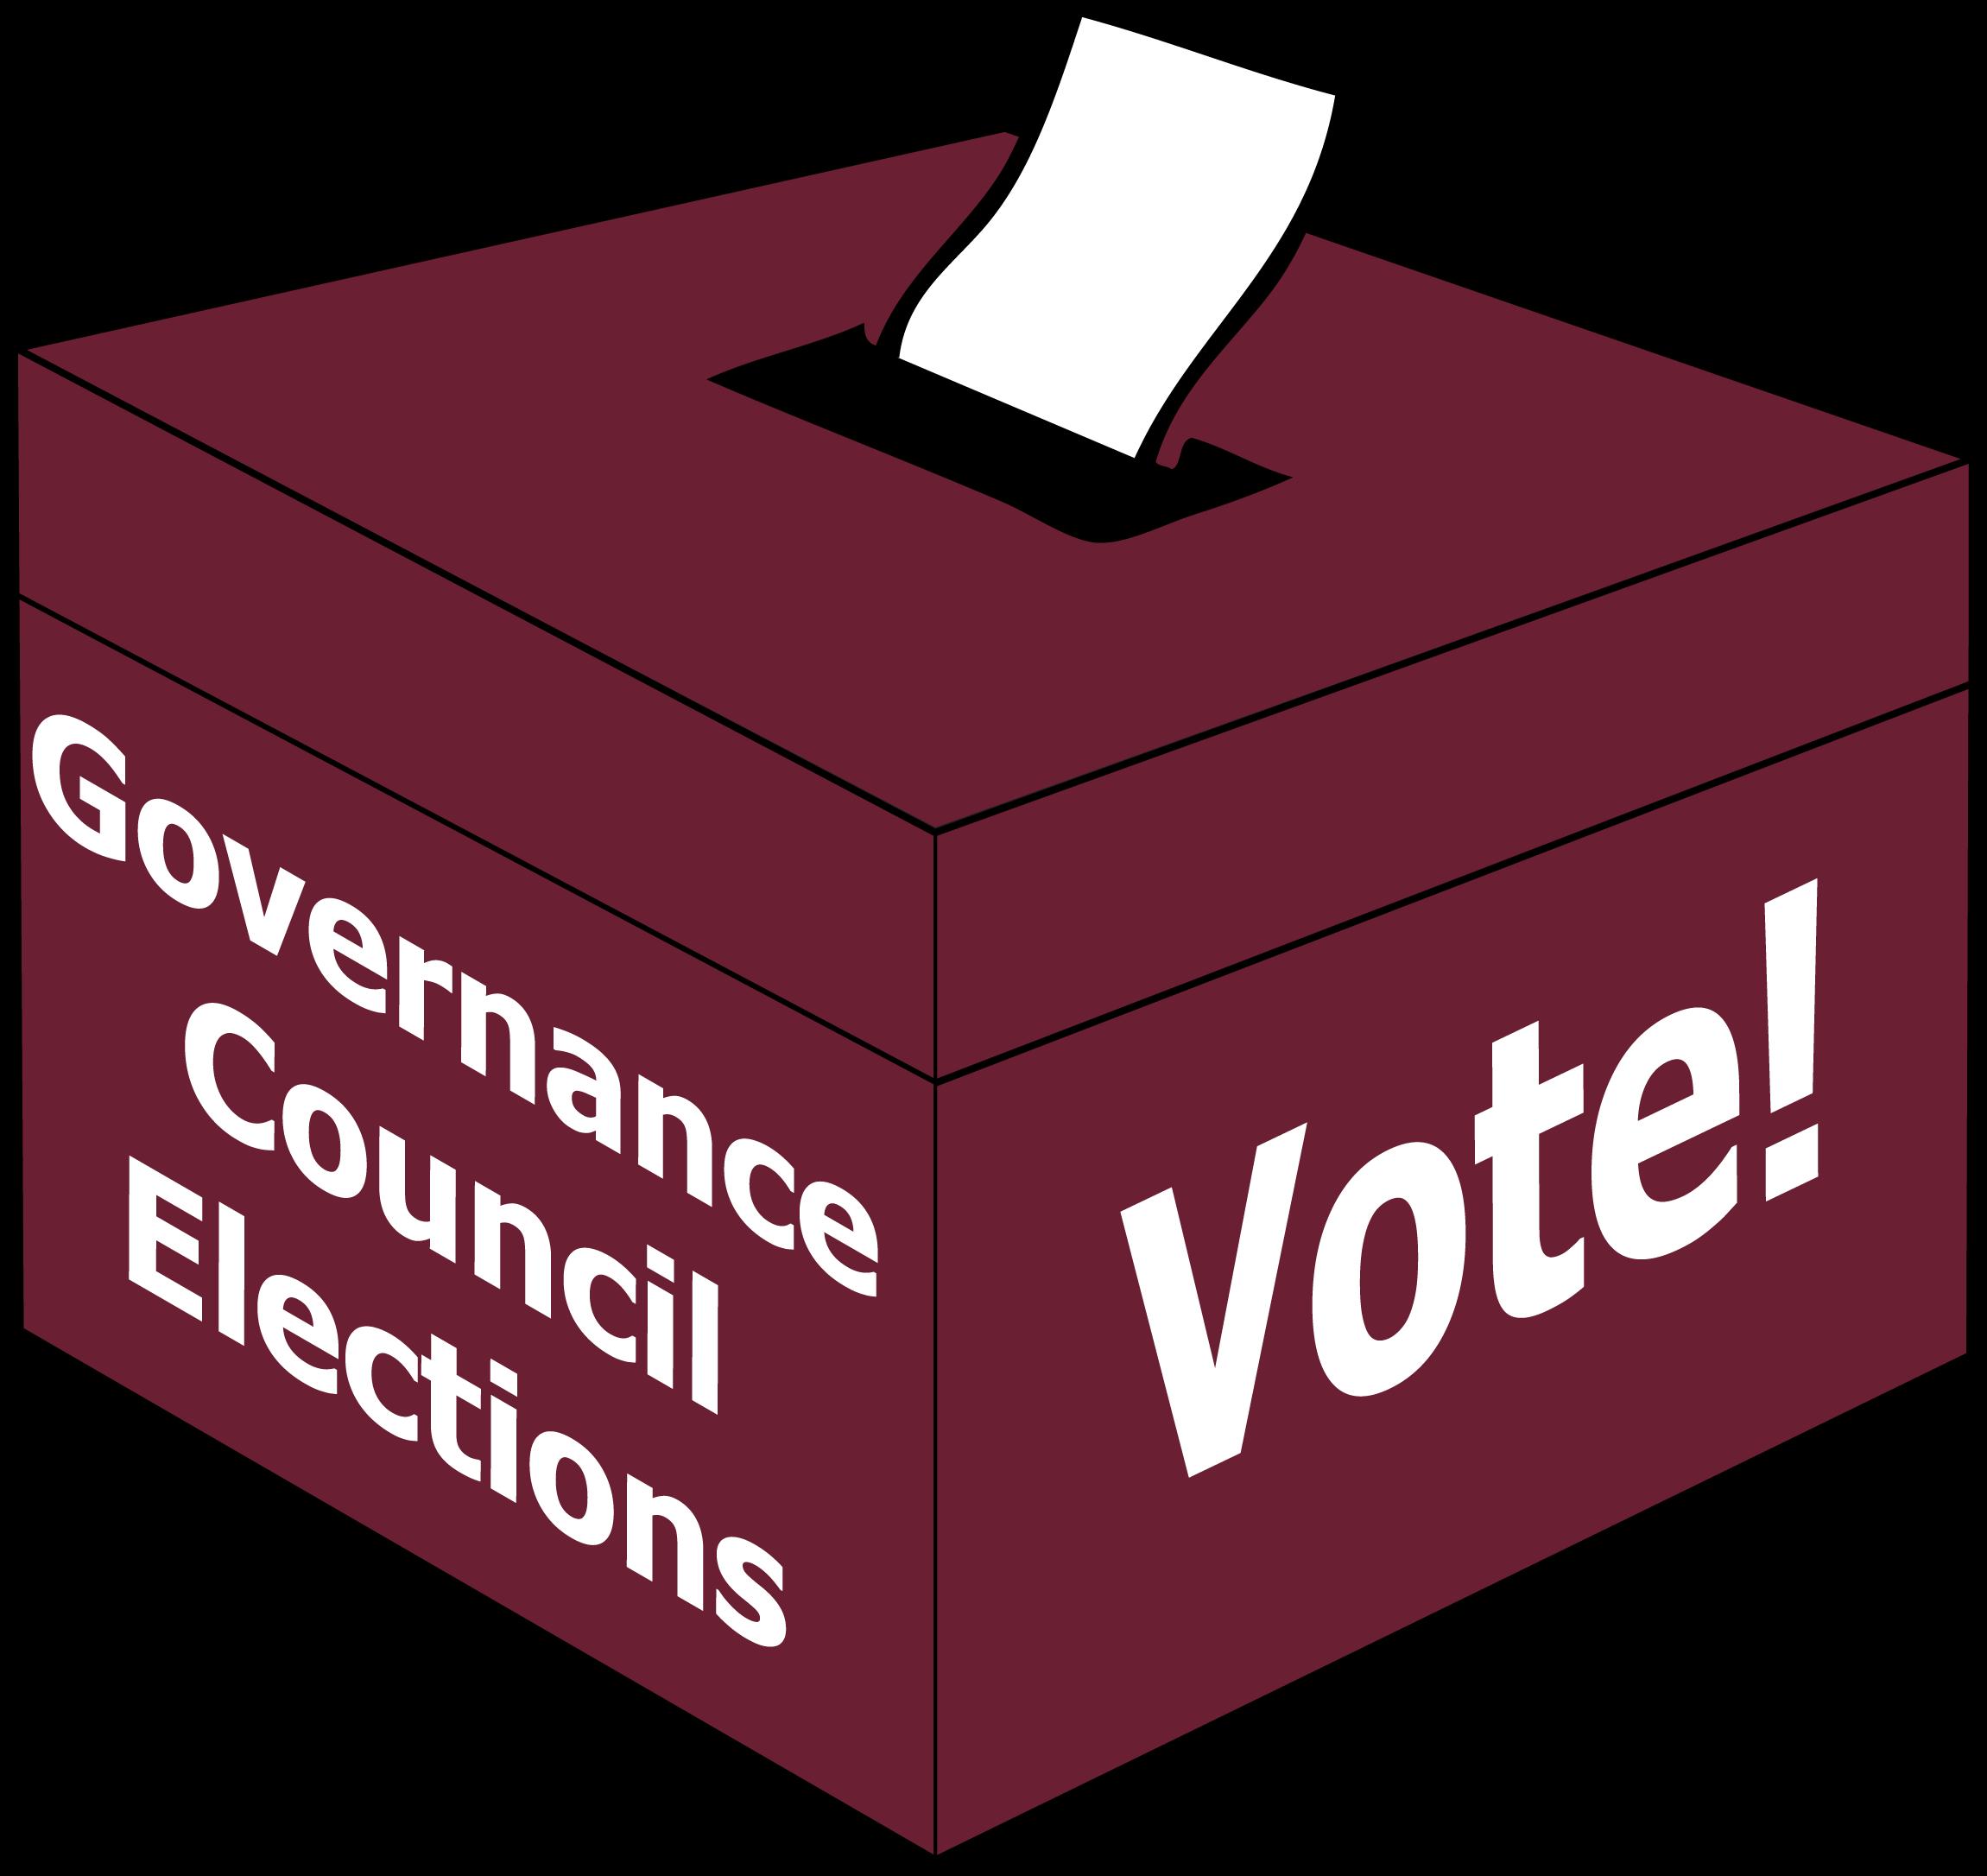 Images all documents ballot. Raffle clipart raffle box